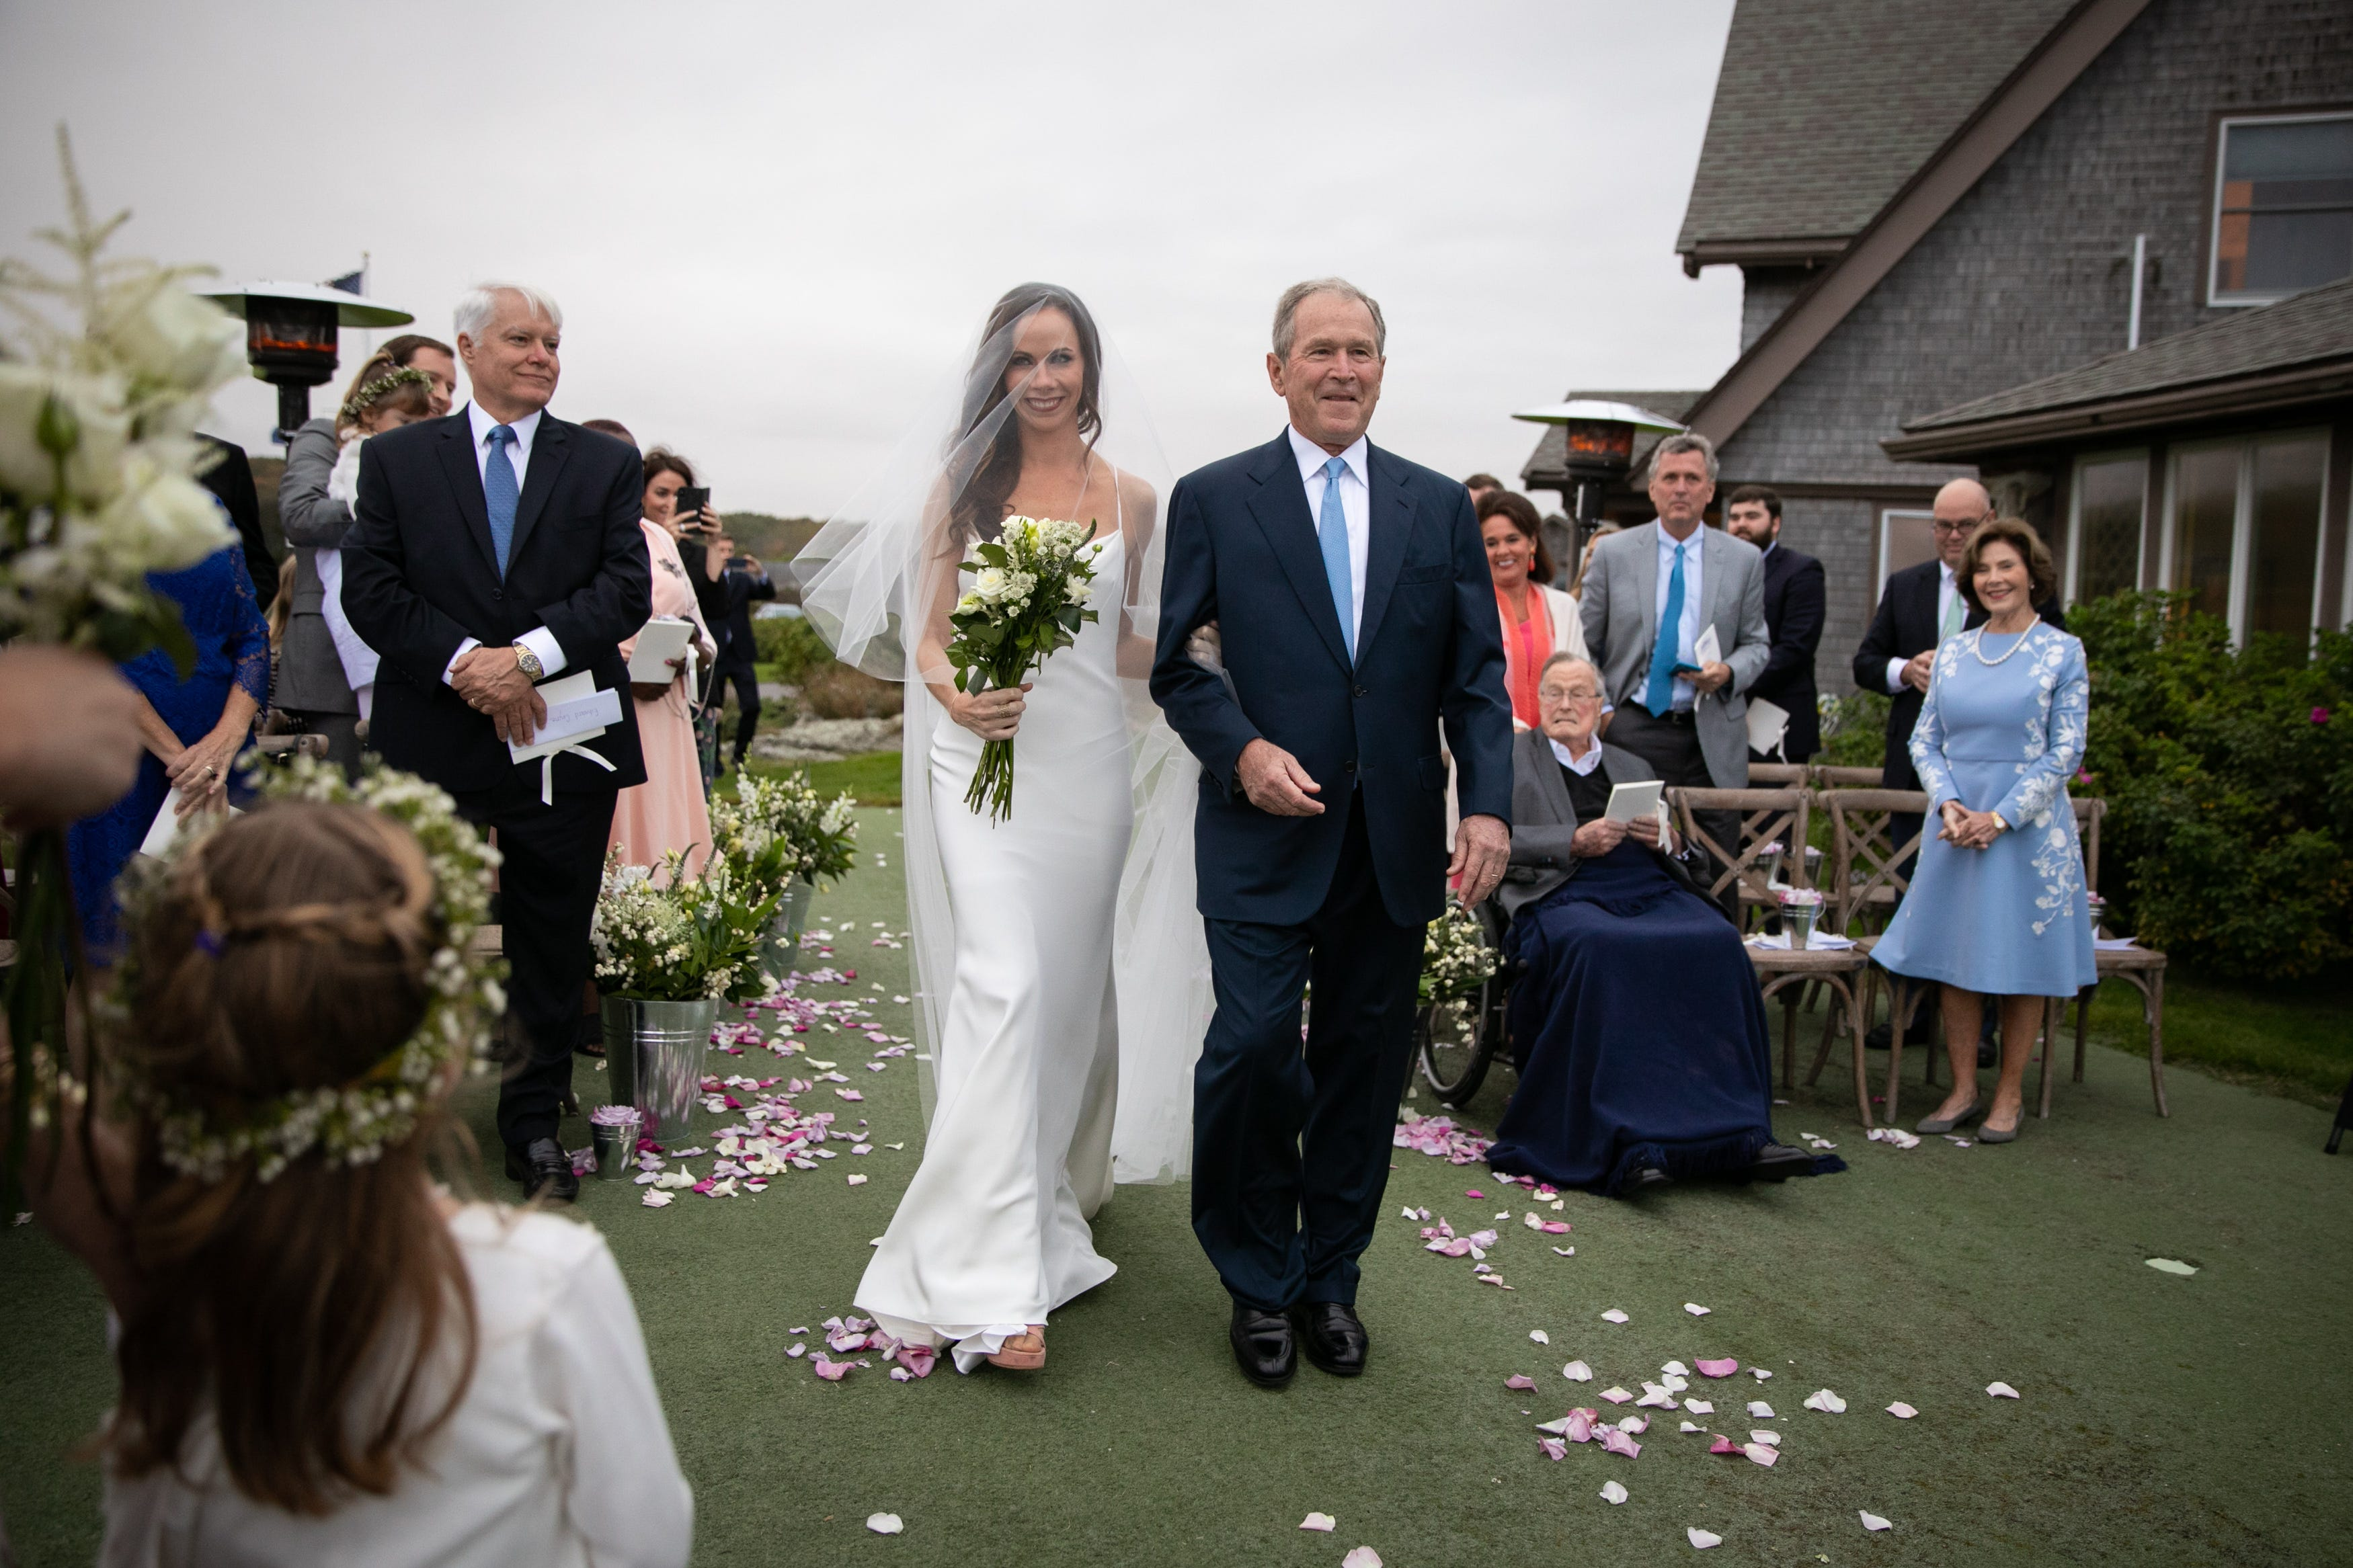 George W. Bush playfully photobombs Jenna Bush Hager and Barbara Bush after wedding